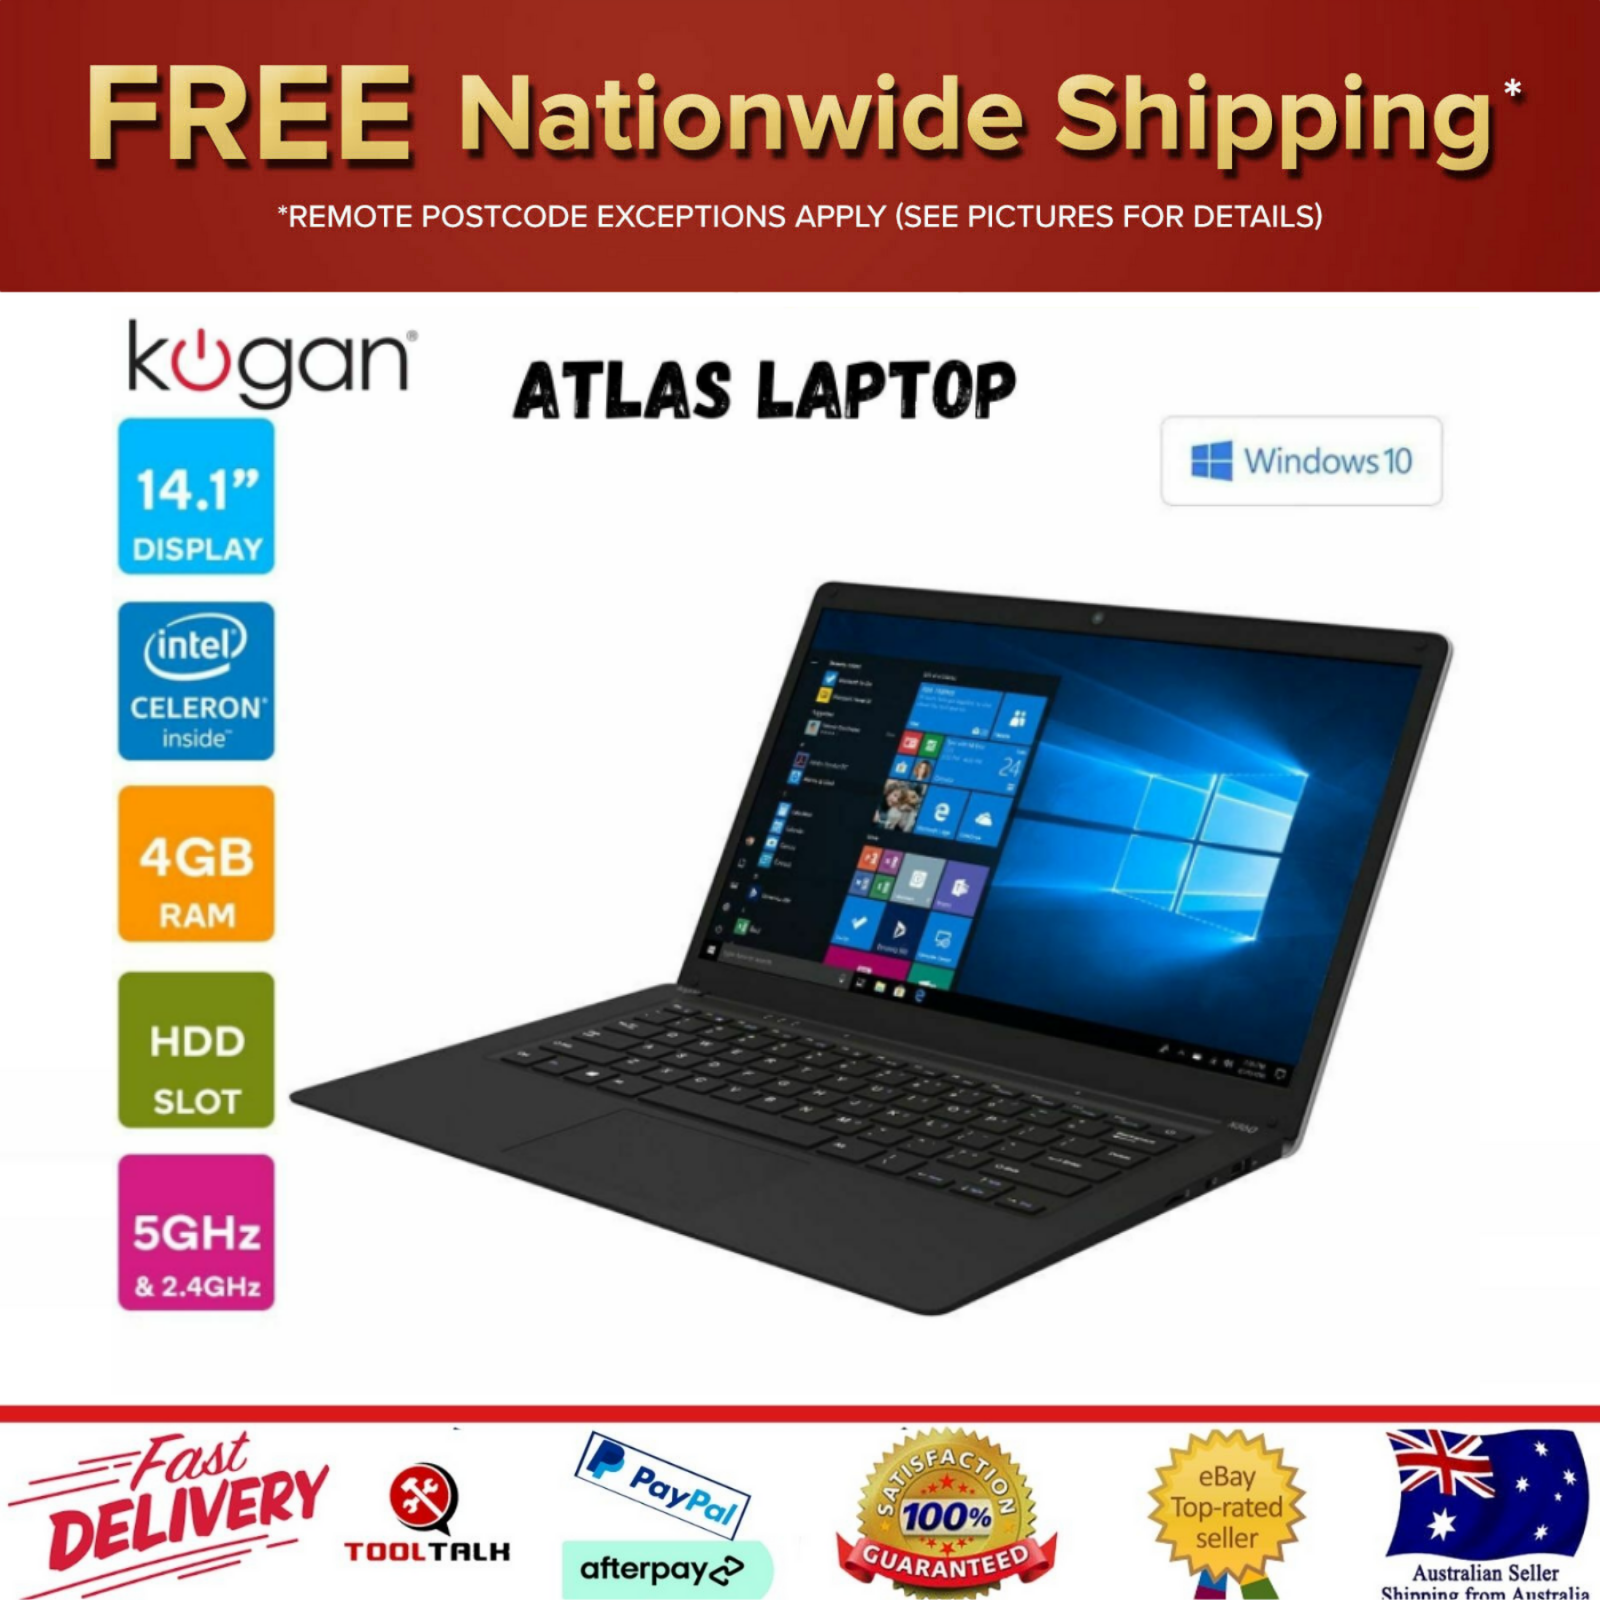 "Laptop Windows - Kogan Atlas 14.1"" Laptop with Windows 10 Pro WiFi Bluetooth 4GB RAM USB N360 New"